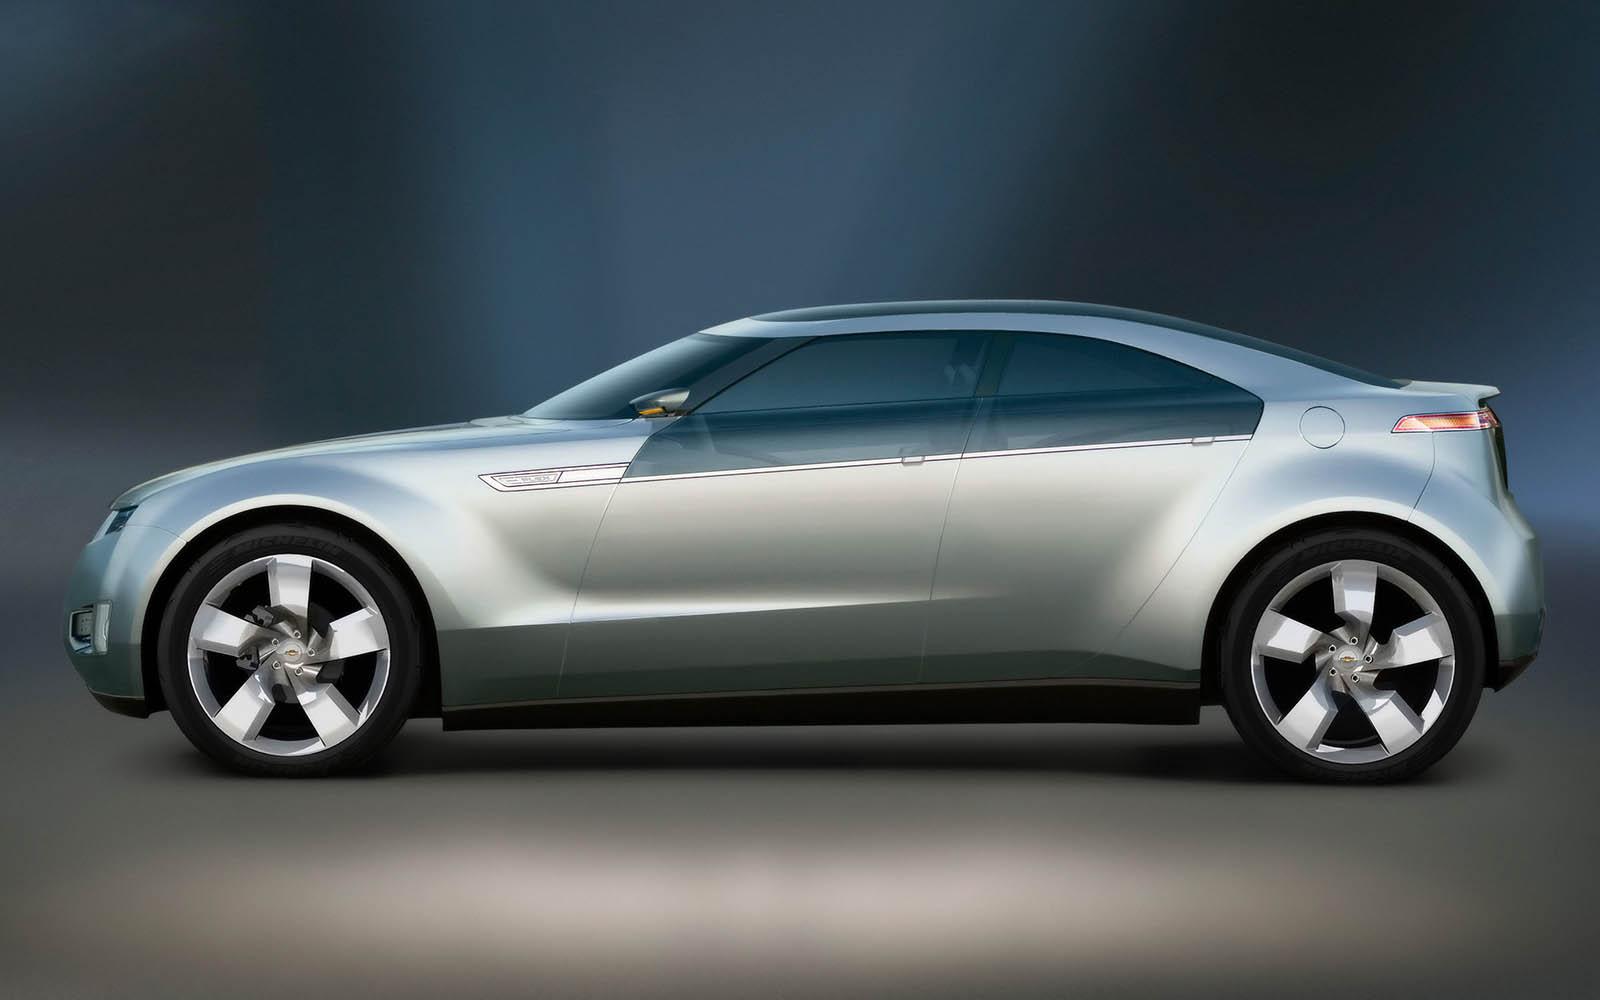 3d Wallpapers Abstract Desktop Backgrounds Wallpapers Chevrolet Volt Concept Car Photos